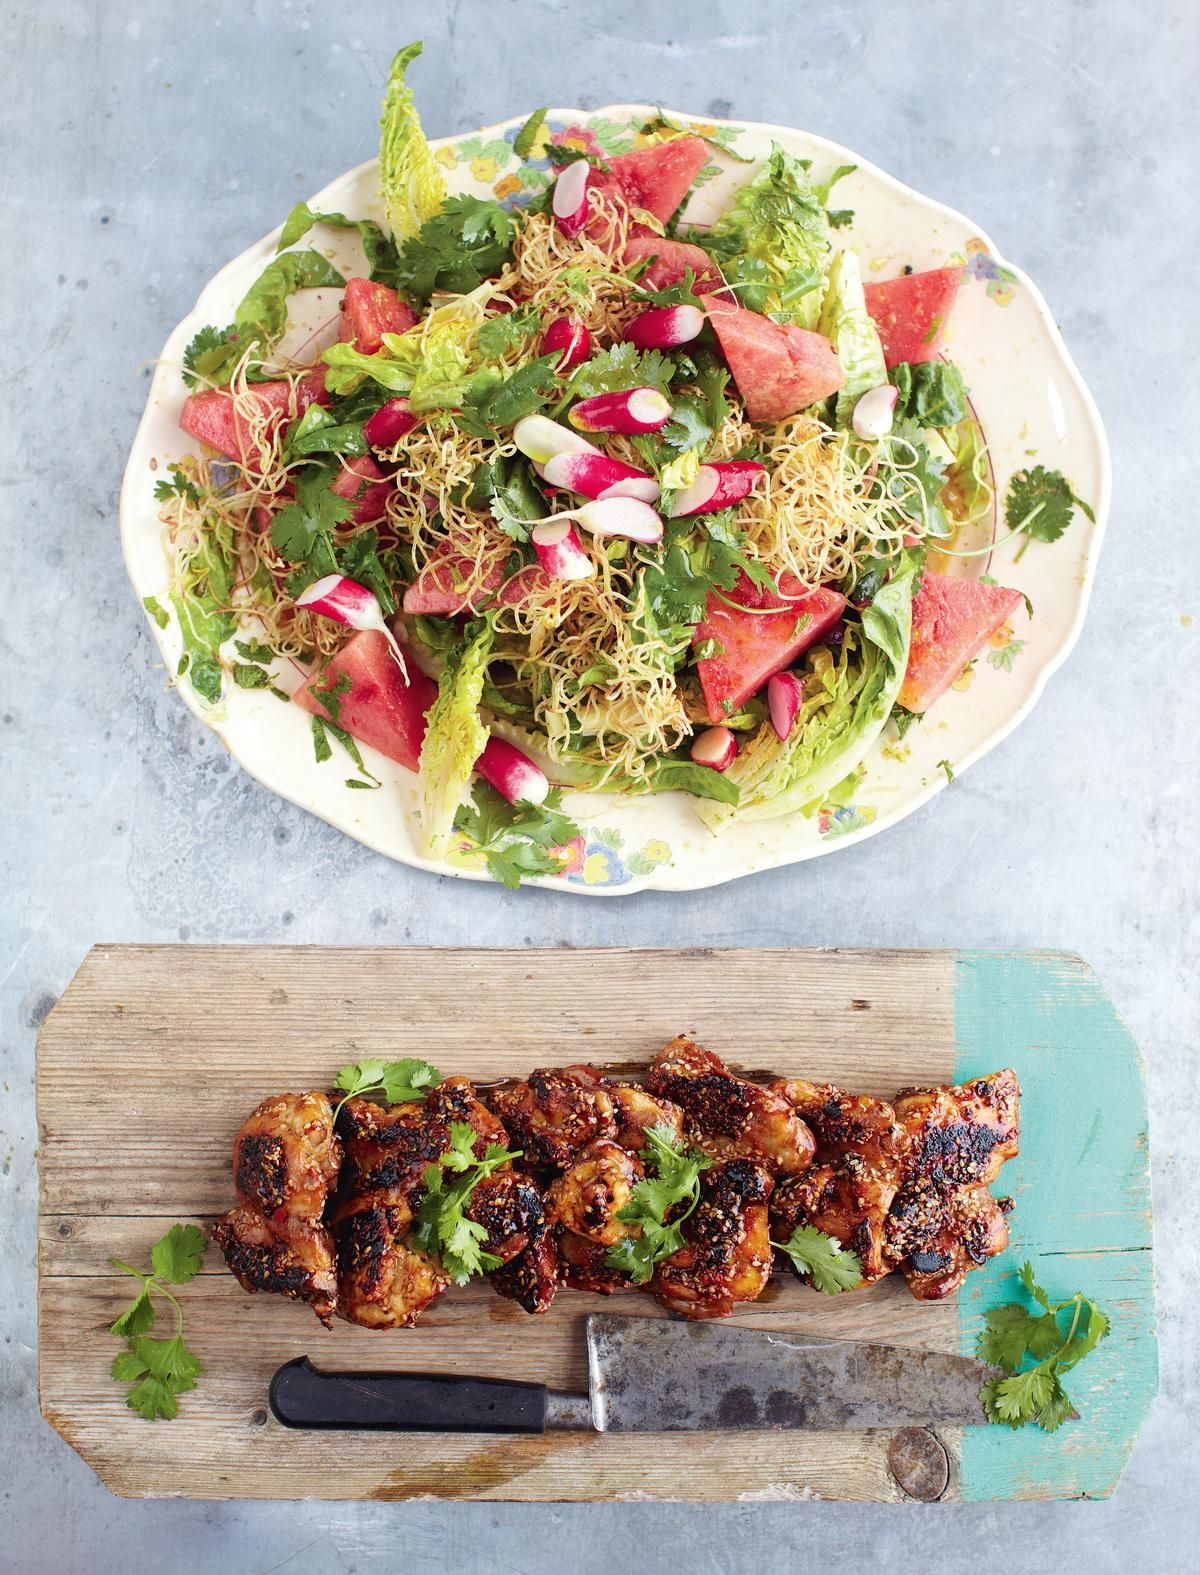 Sticky Kicking Chicken Watermelon Radish Salad And Crunchy Noodles